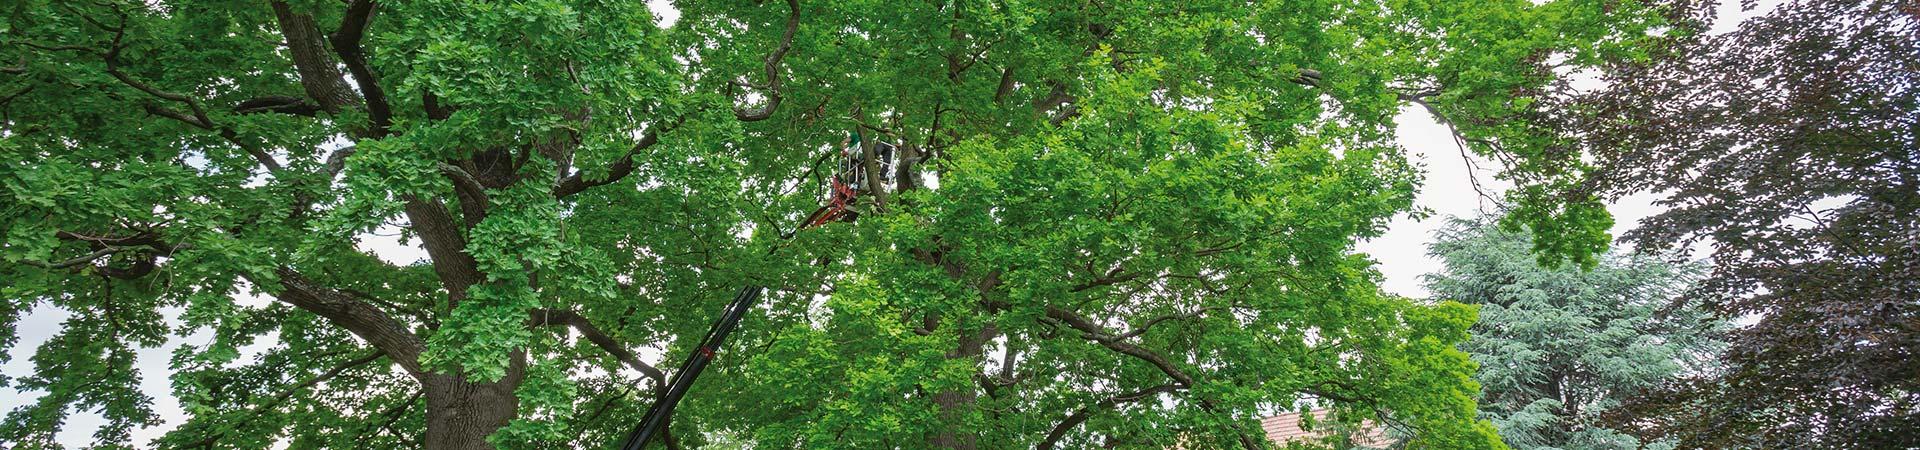 Baumpflege Kreitl